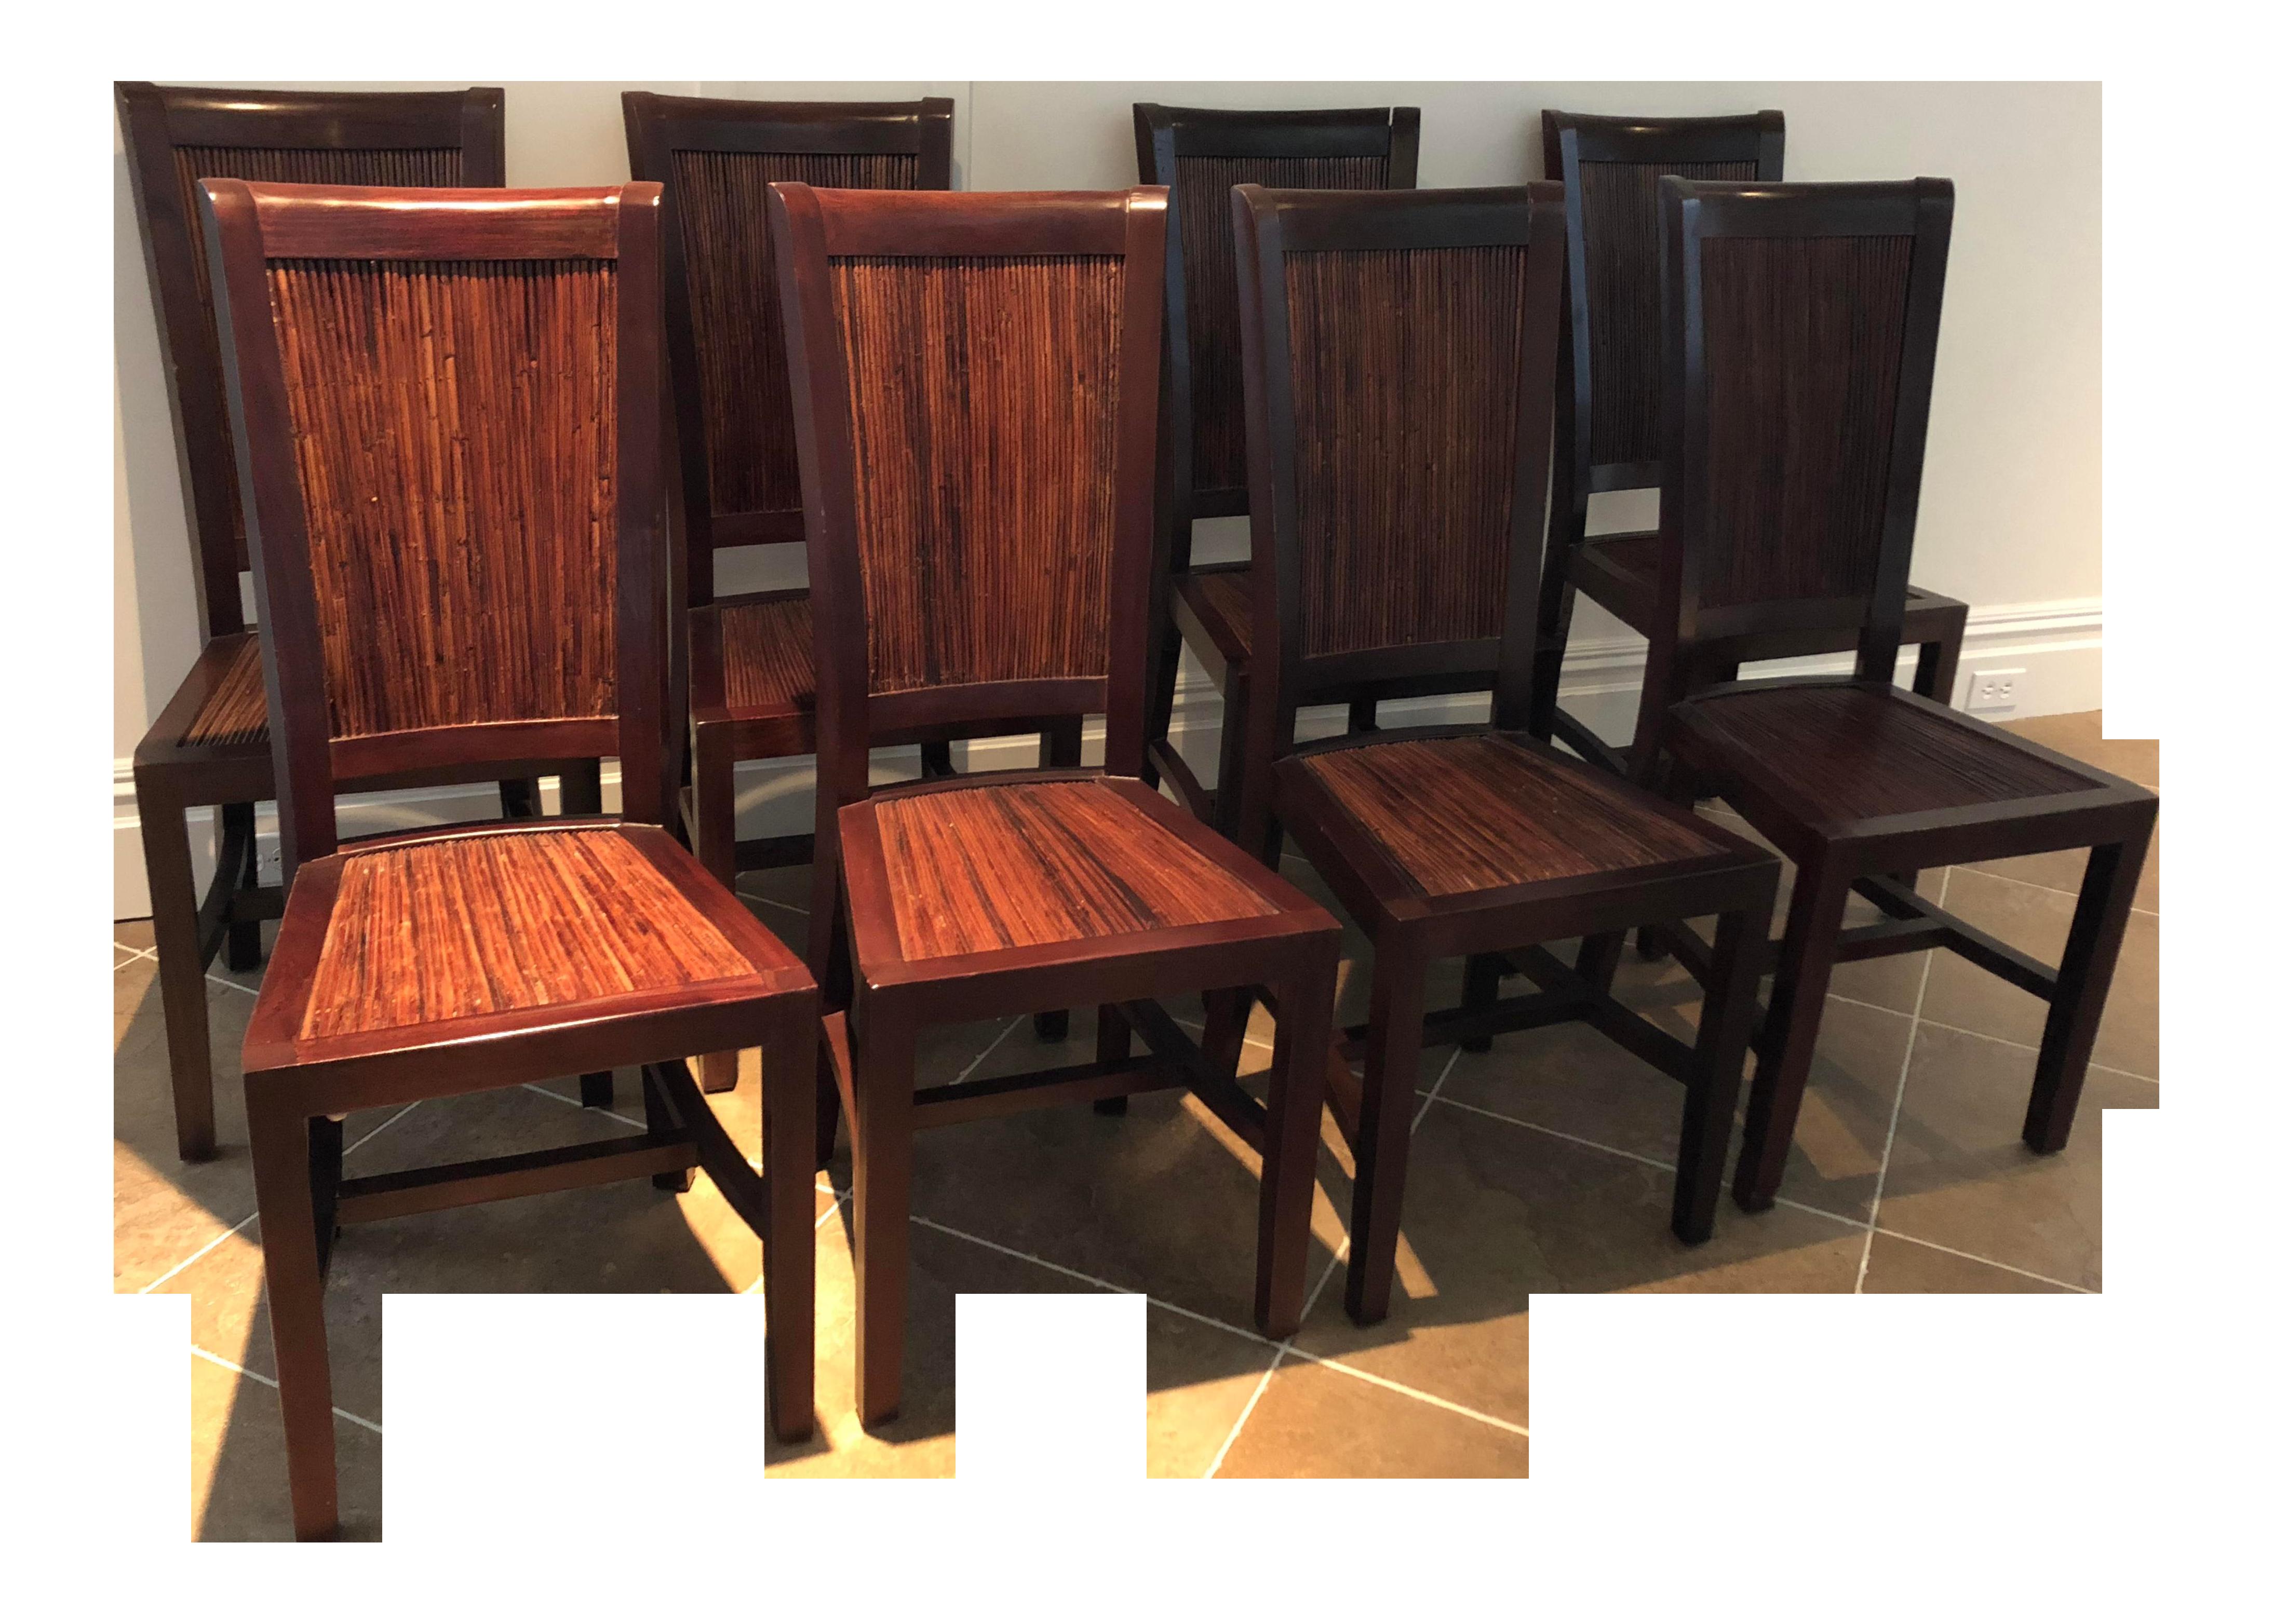 Custom Klismos Dining Chairs Set Of 8 Chairish Dining Chairs Klismos Dining Chair Chair